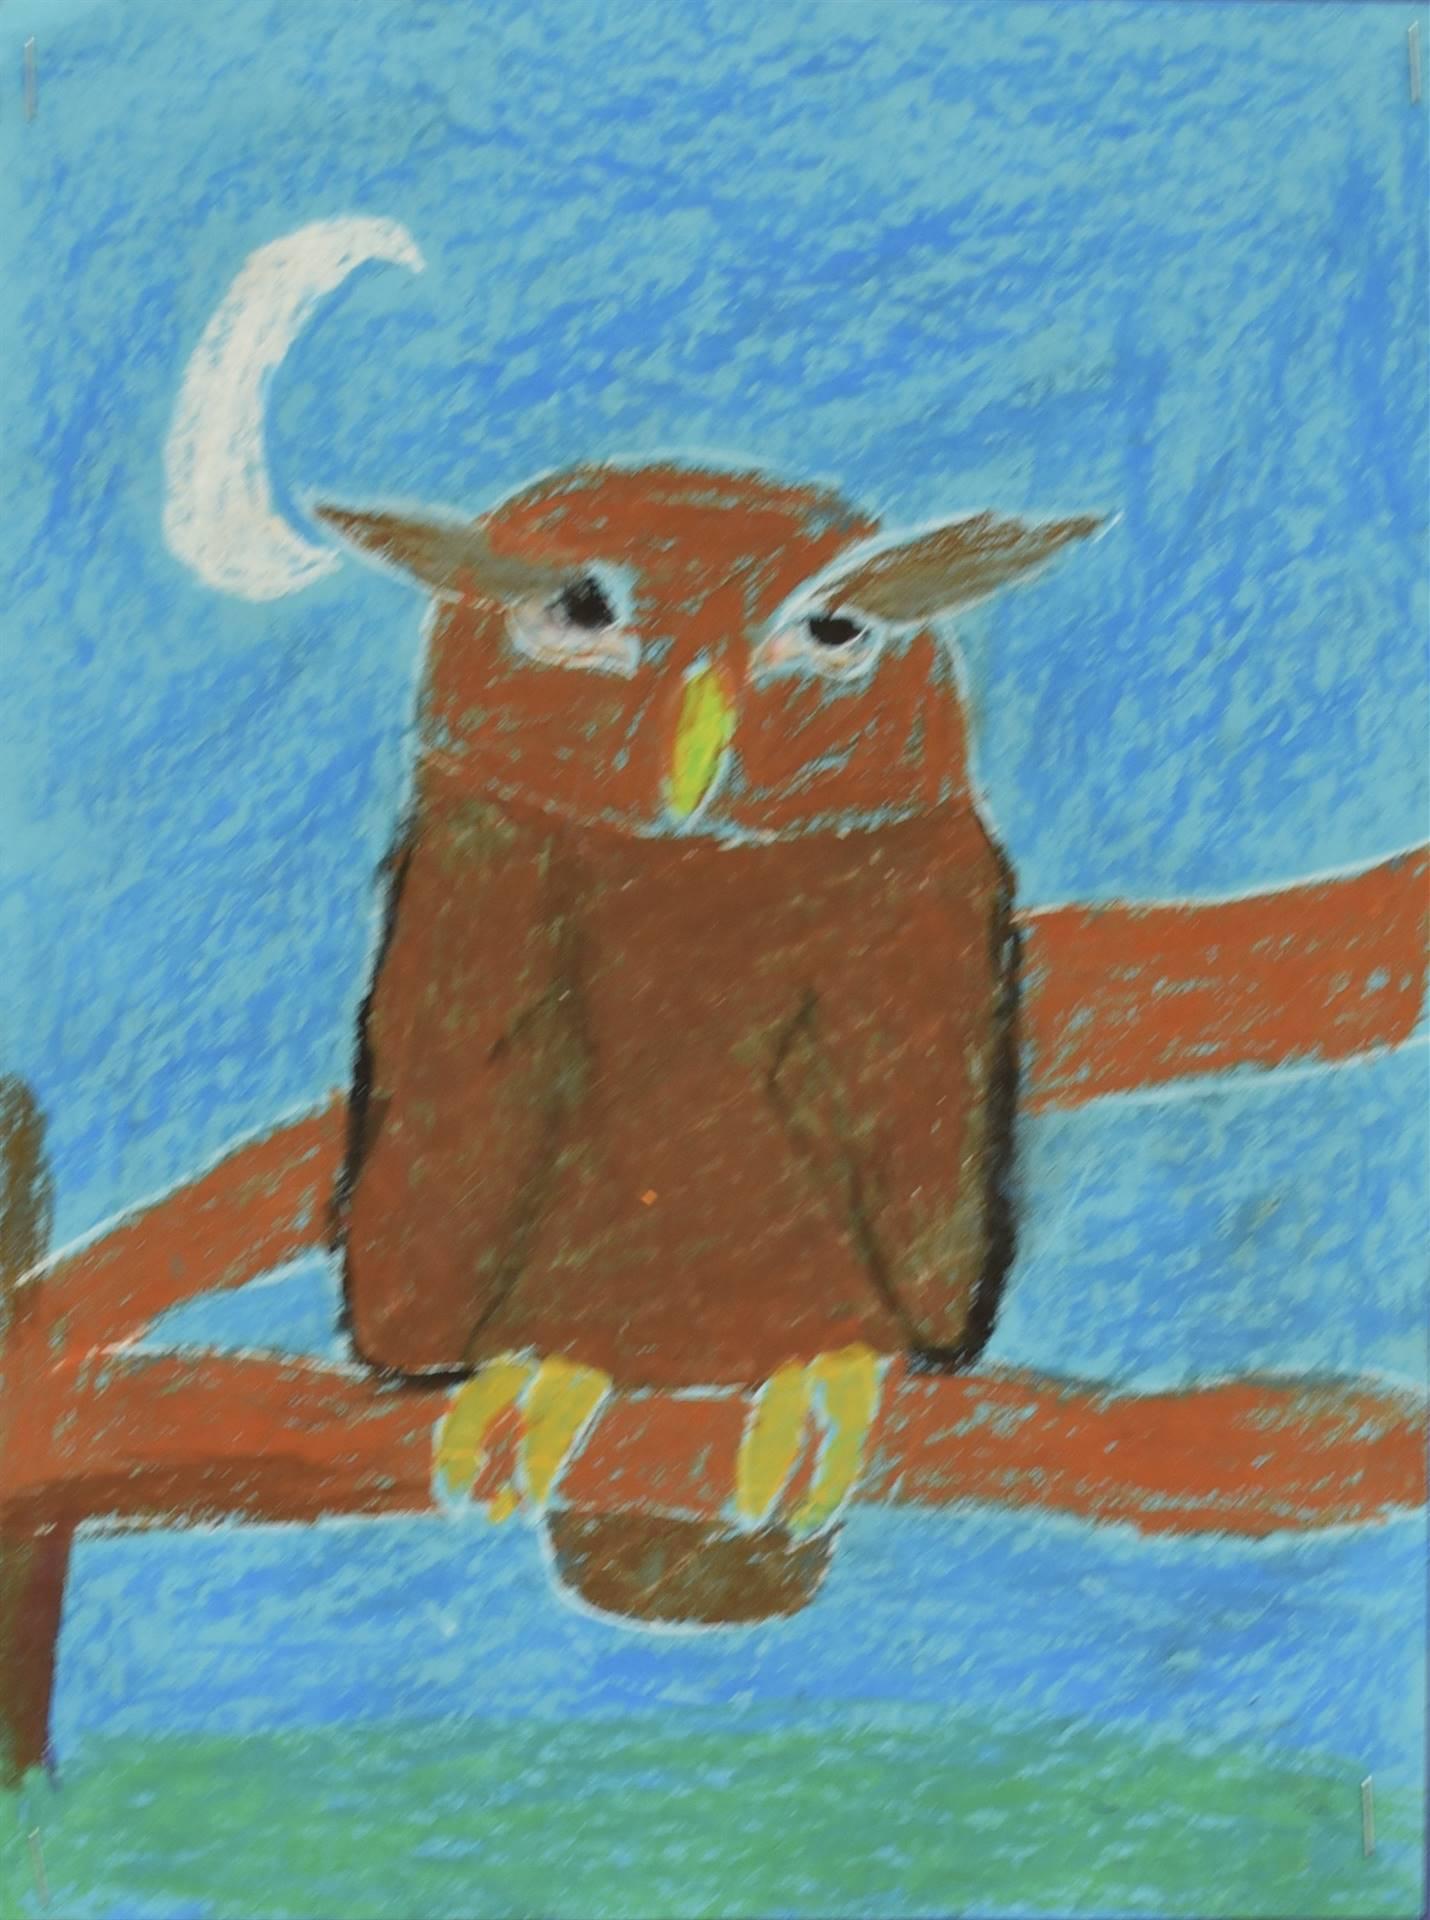 Brecksville-Broadview Hts. Middle School Art Projects 109